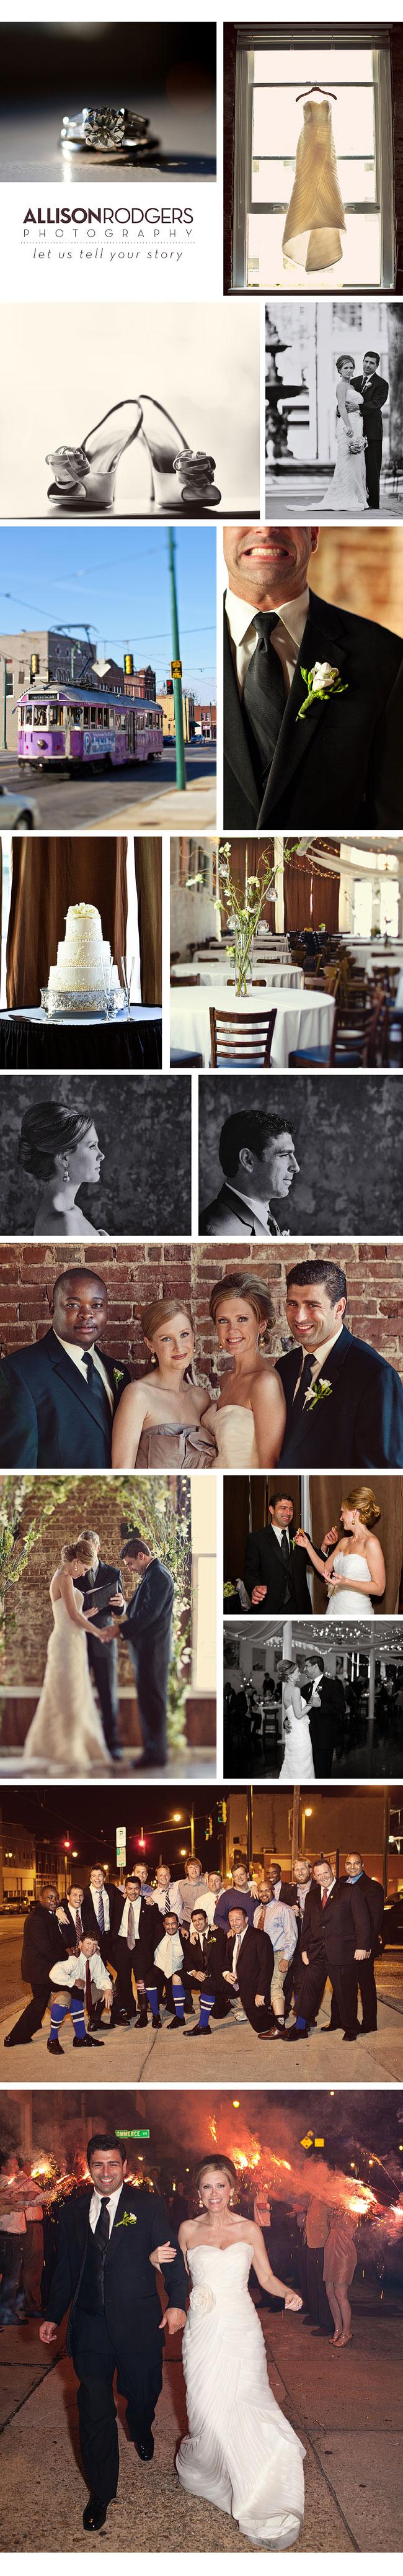 BARNES-wedding-day-photography